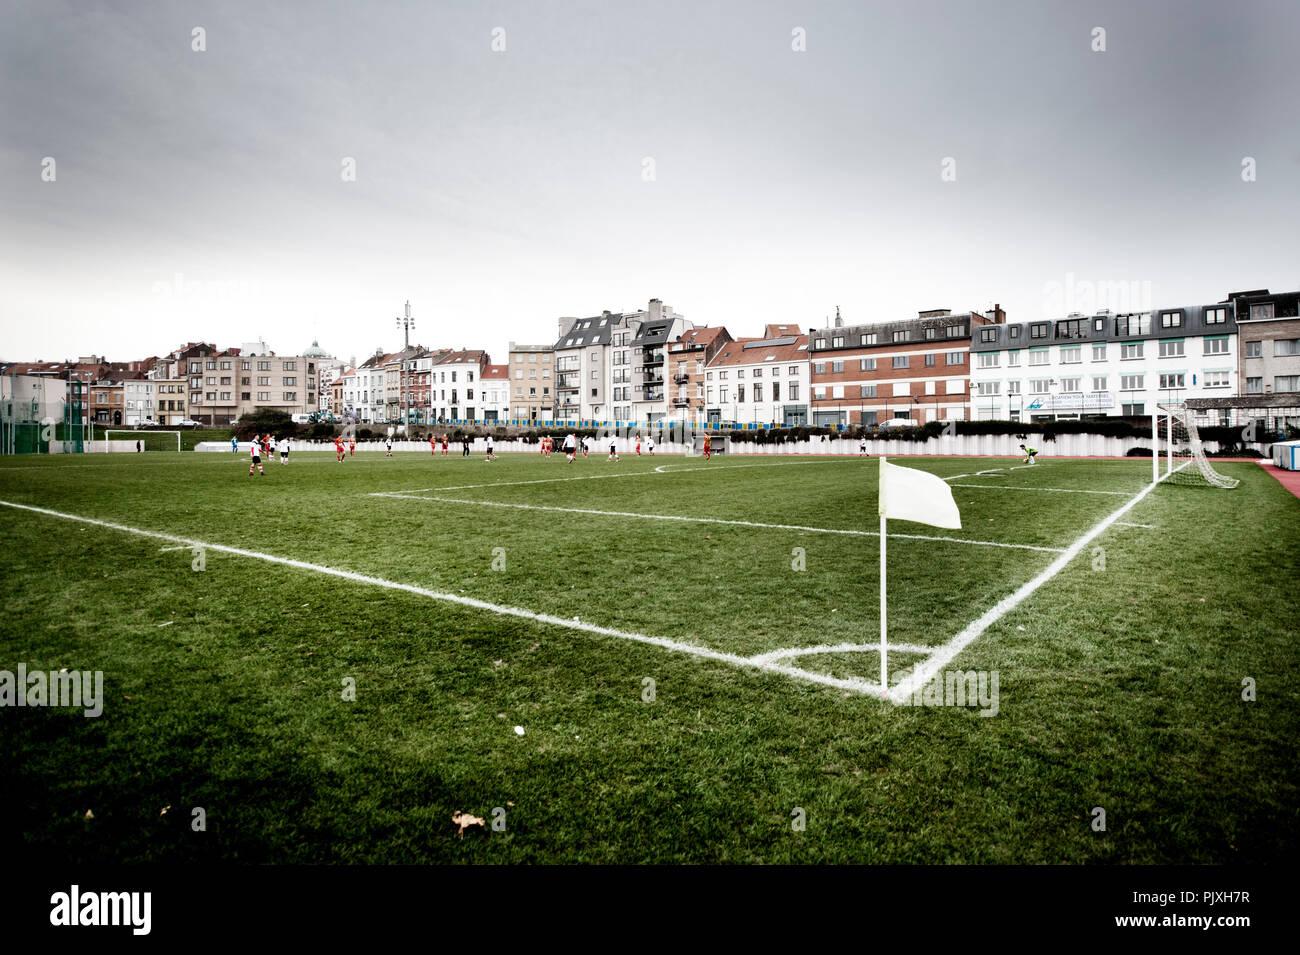 The football game between the promises of RWD Molenbeek and KSV Bornem in the Sippelberg football stadium in Molenbeek-Saint-Jean, Brussels (Belgium,  - Stock Image